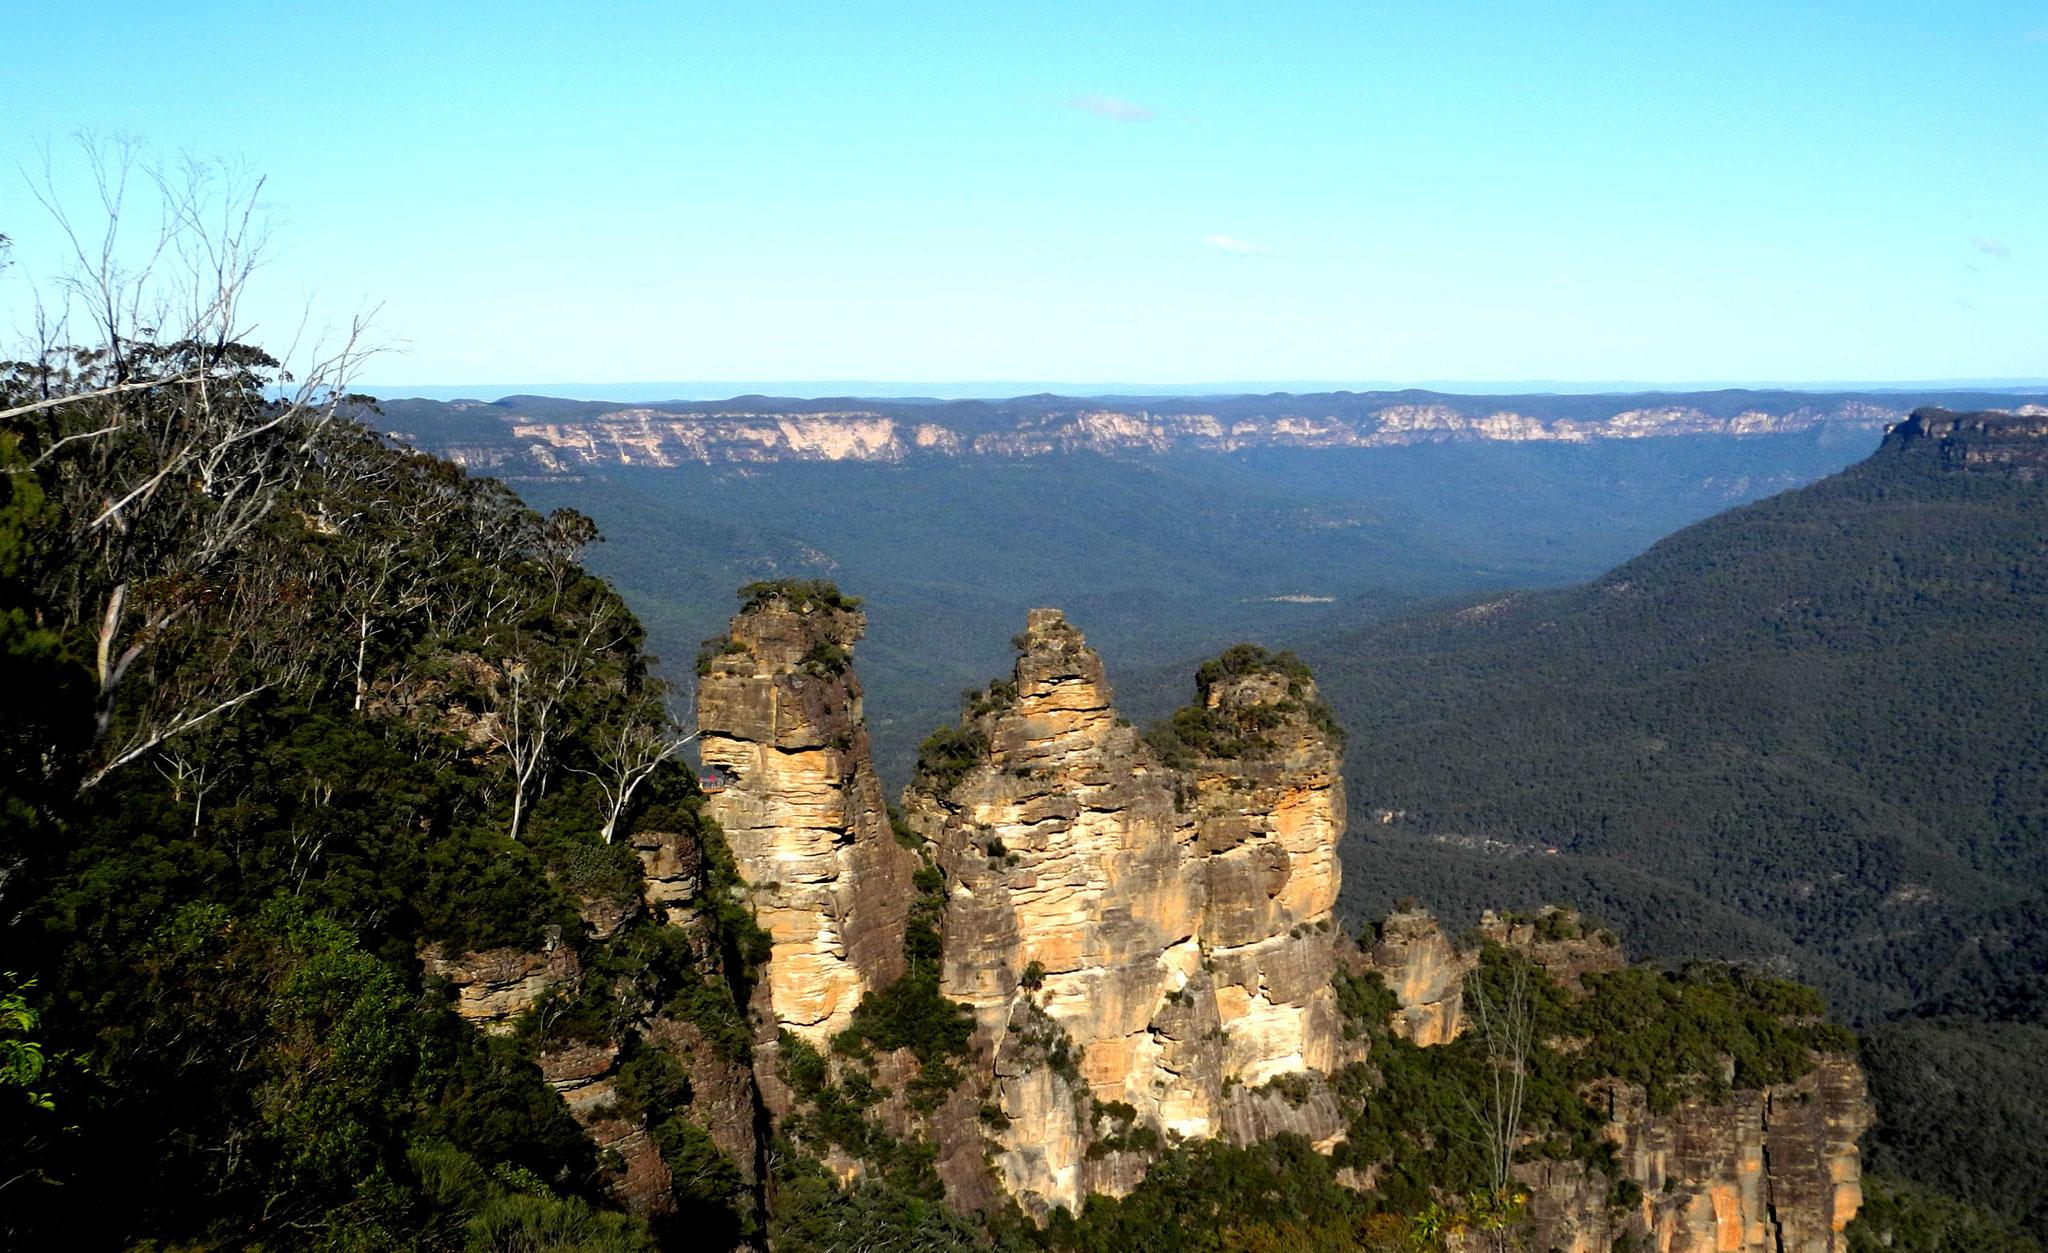 Der berühmteste Blick in den Blue Mountains - The Three Sisters